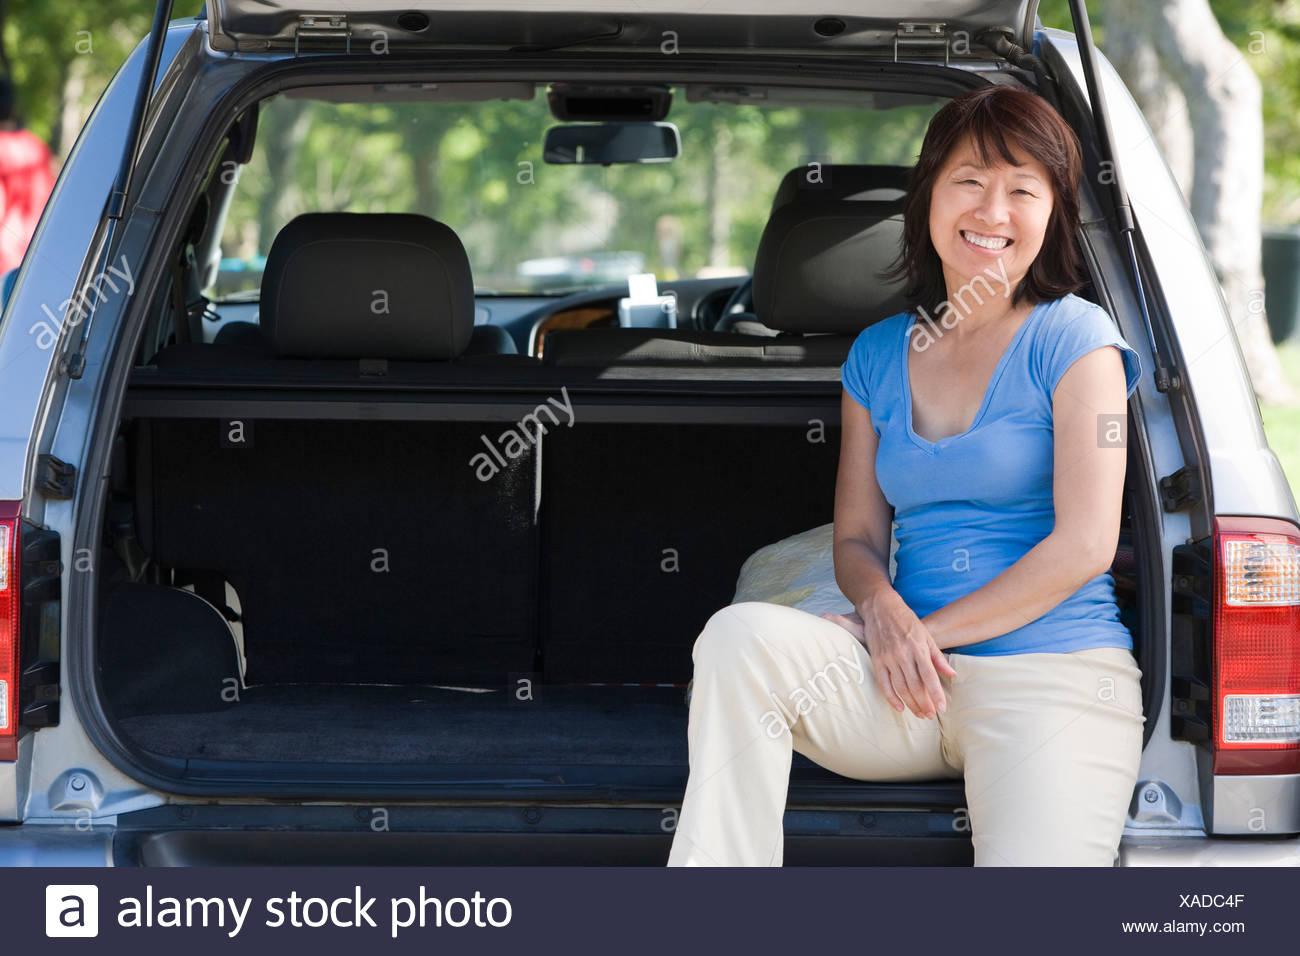 Woman sitting in back of van smiling - Stock Image